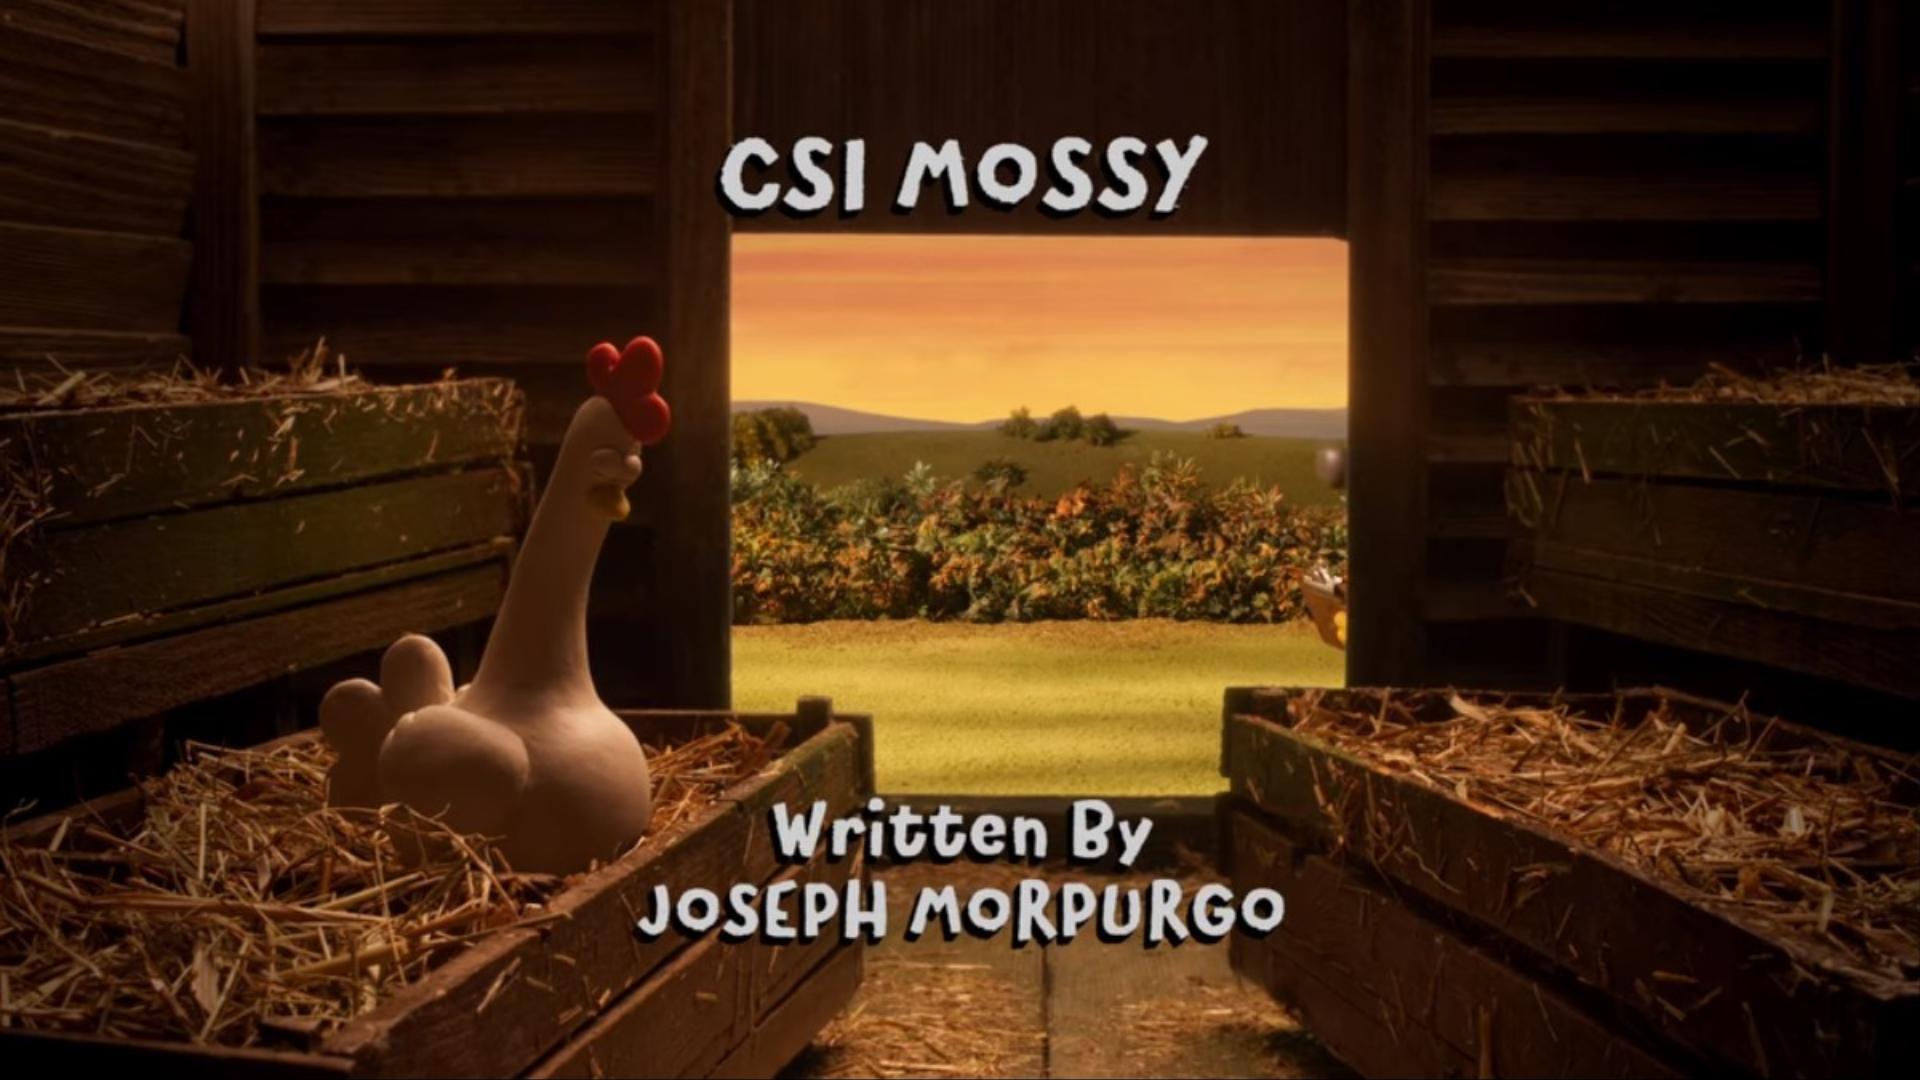 CSI Mossy